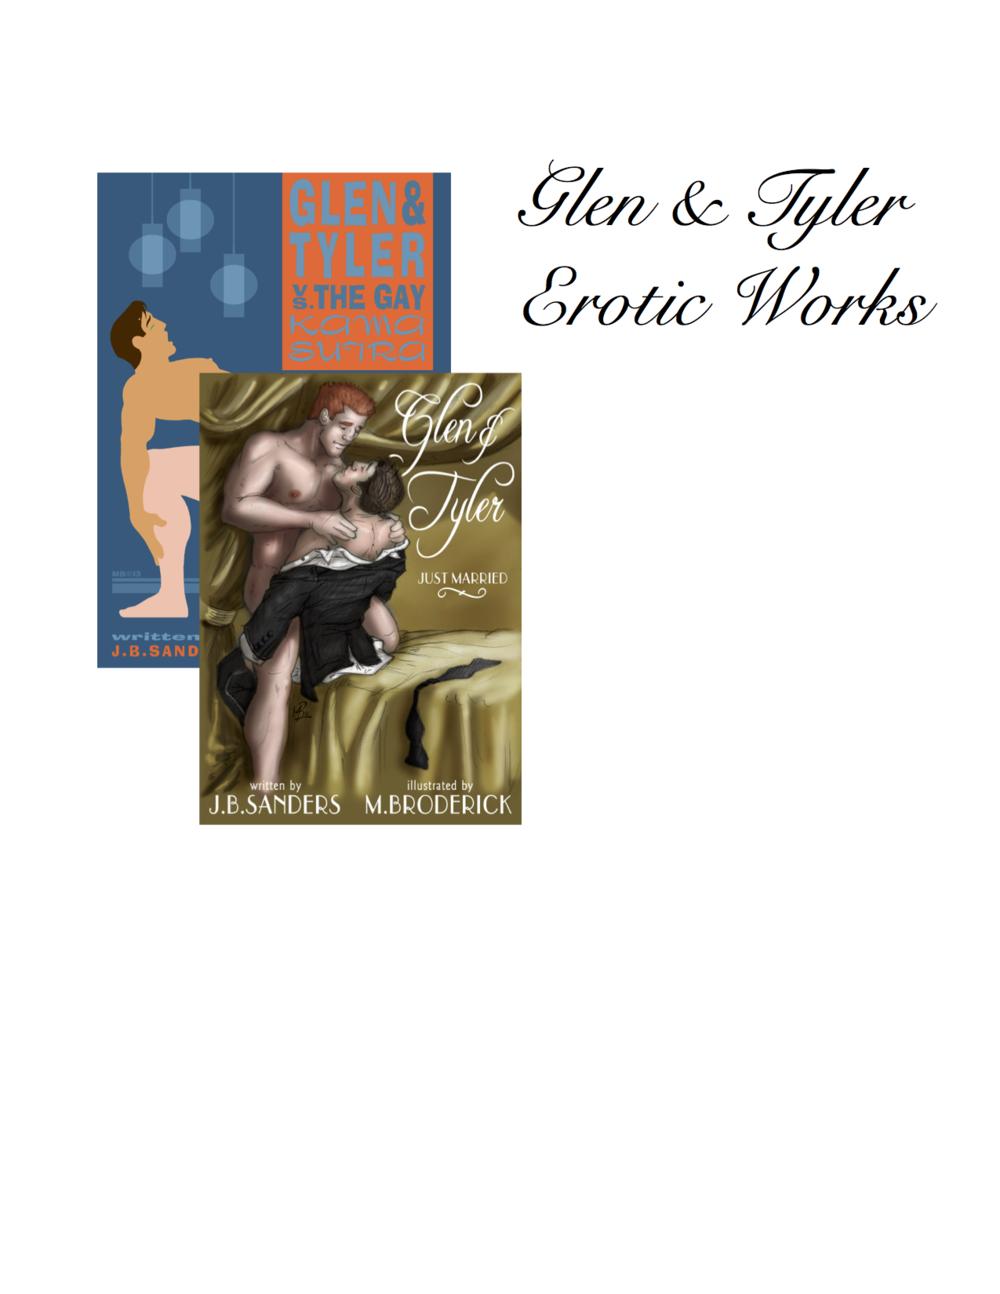 Glen & Tyler Illustrated Erotic Stories